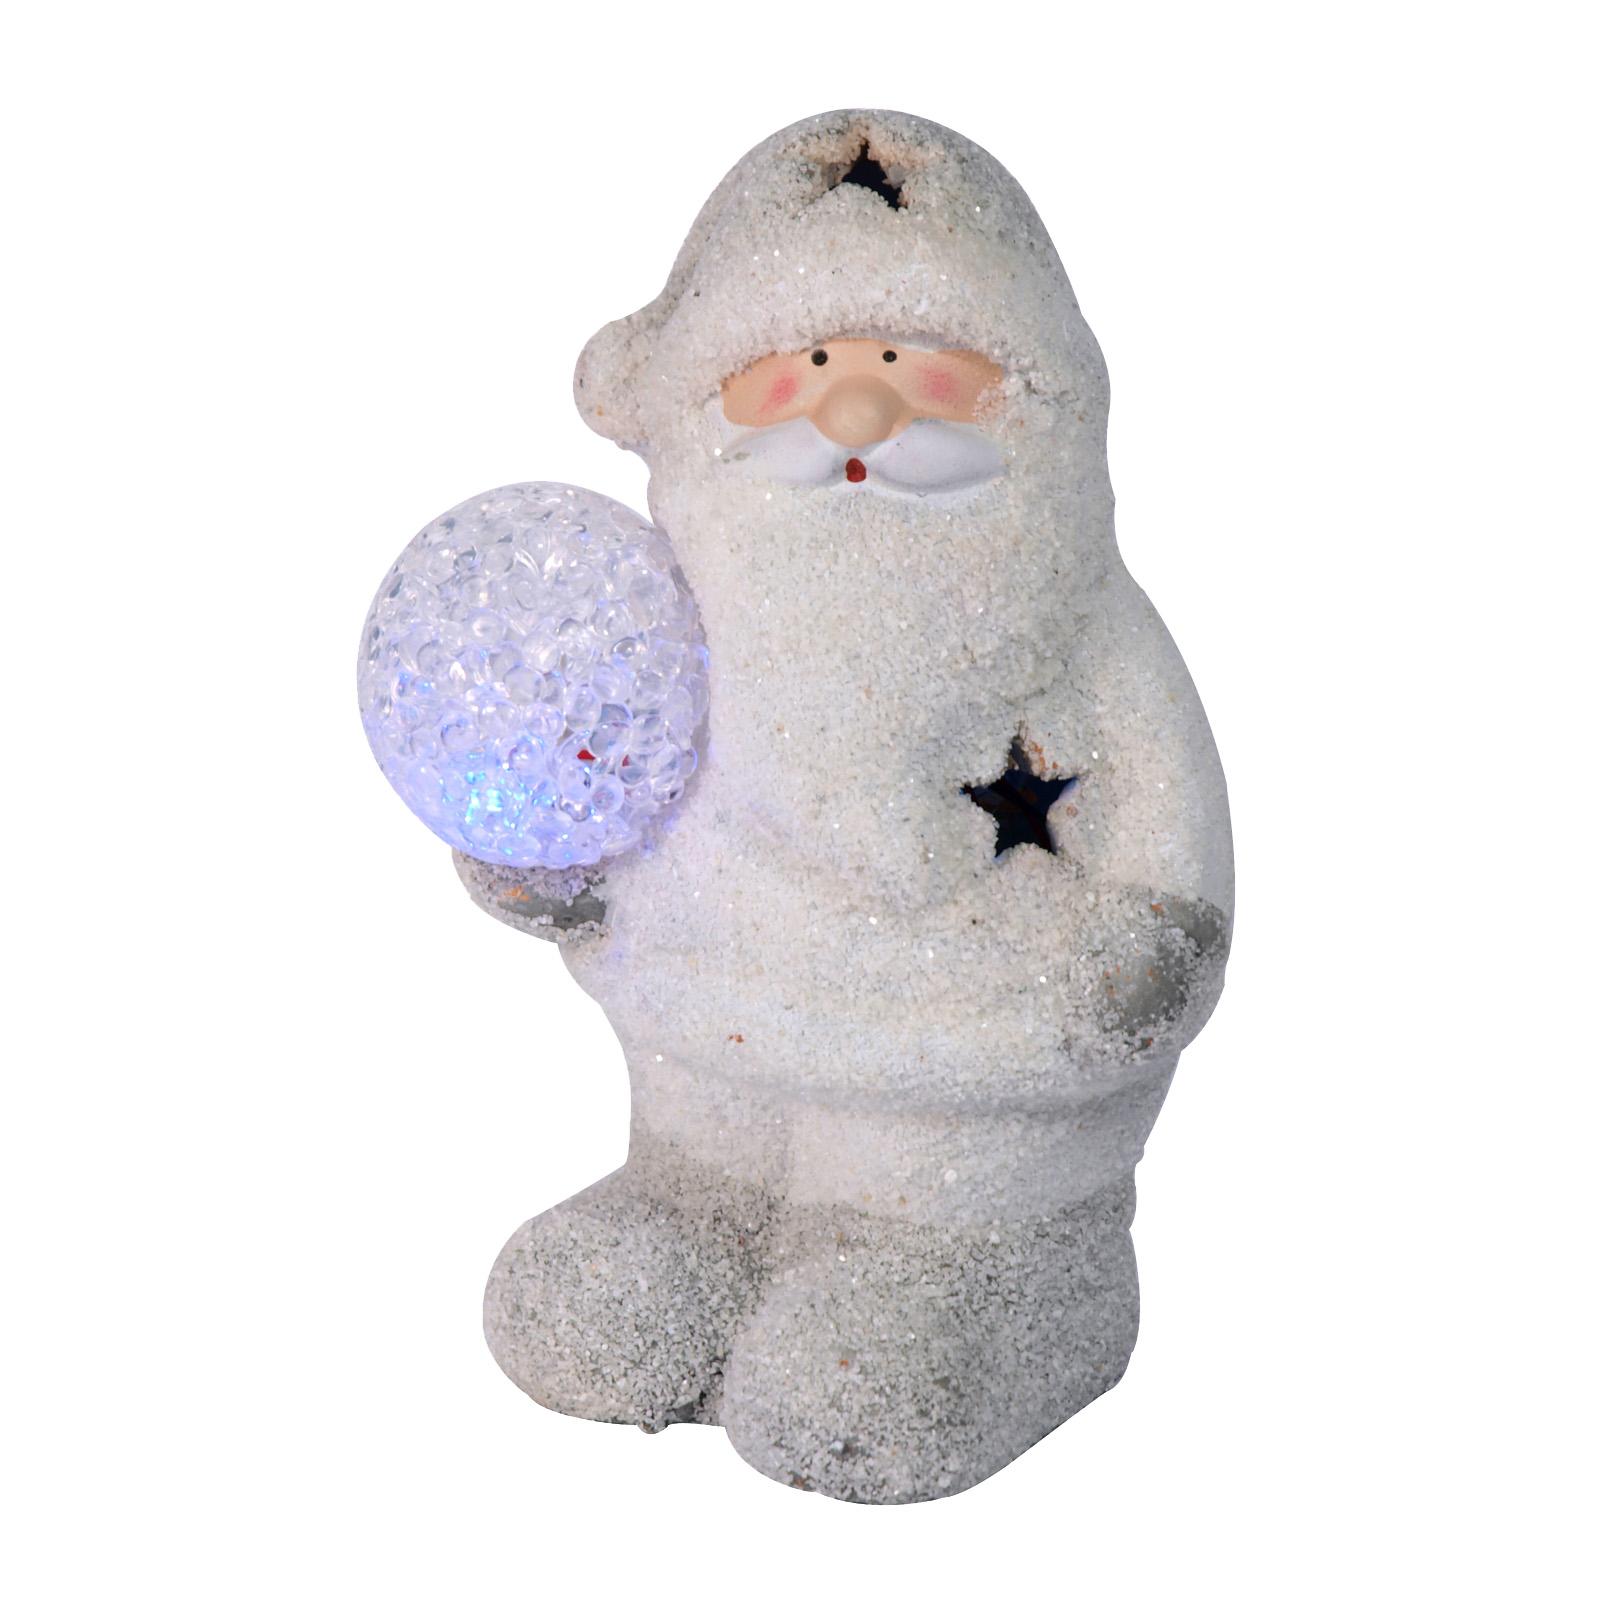 X-MAS SNOWMAN+LED SNOWBALL STANDING